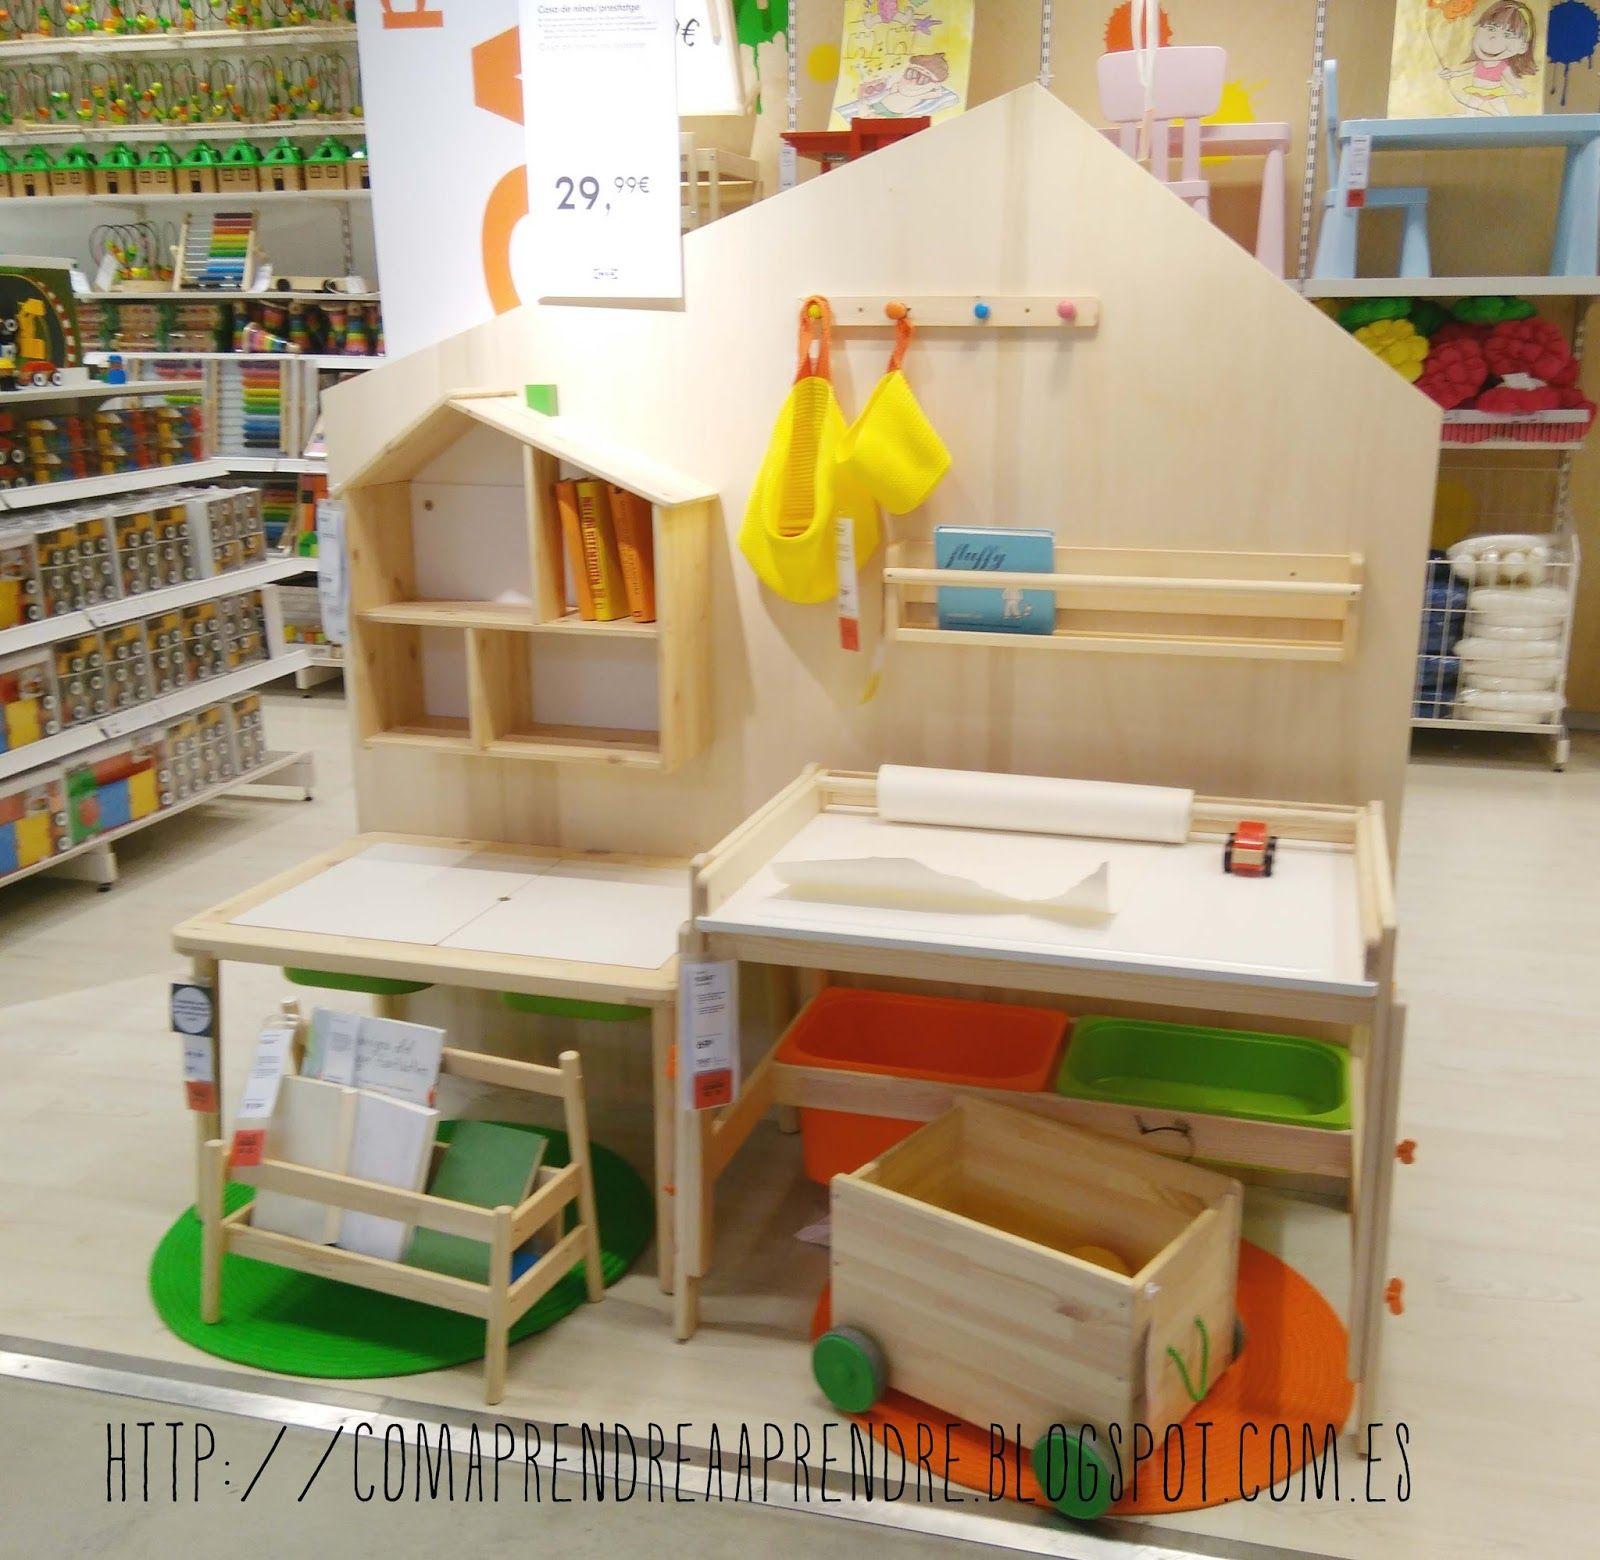 com aprendre a aprendre montessori i ikea escuela activa montessori waldorf freinet. Black Bedroom Furniture Sets. Home Design Ideas